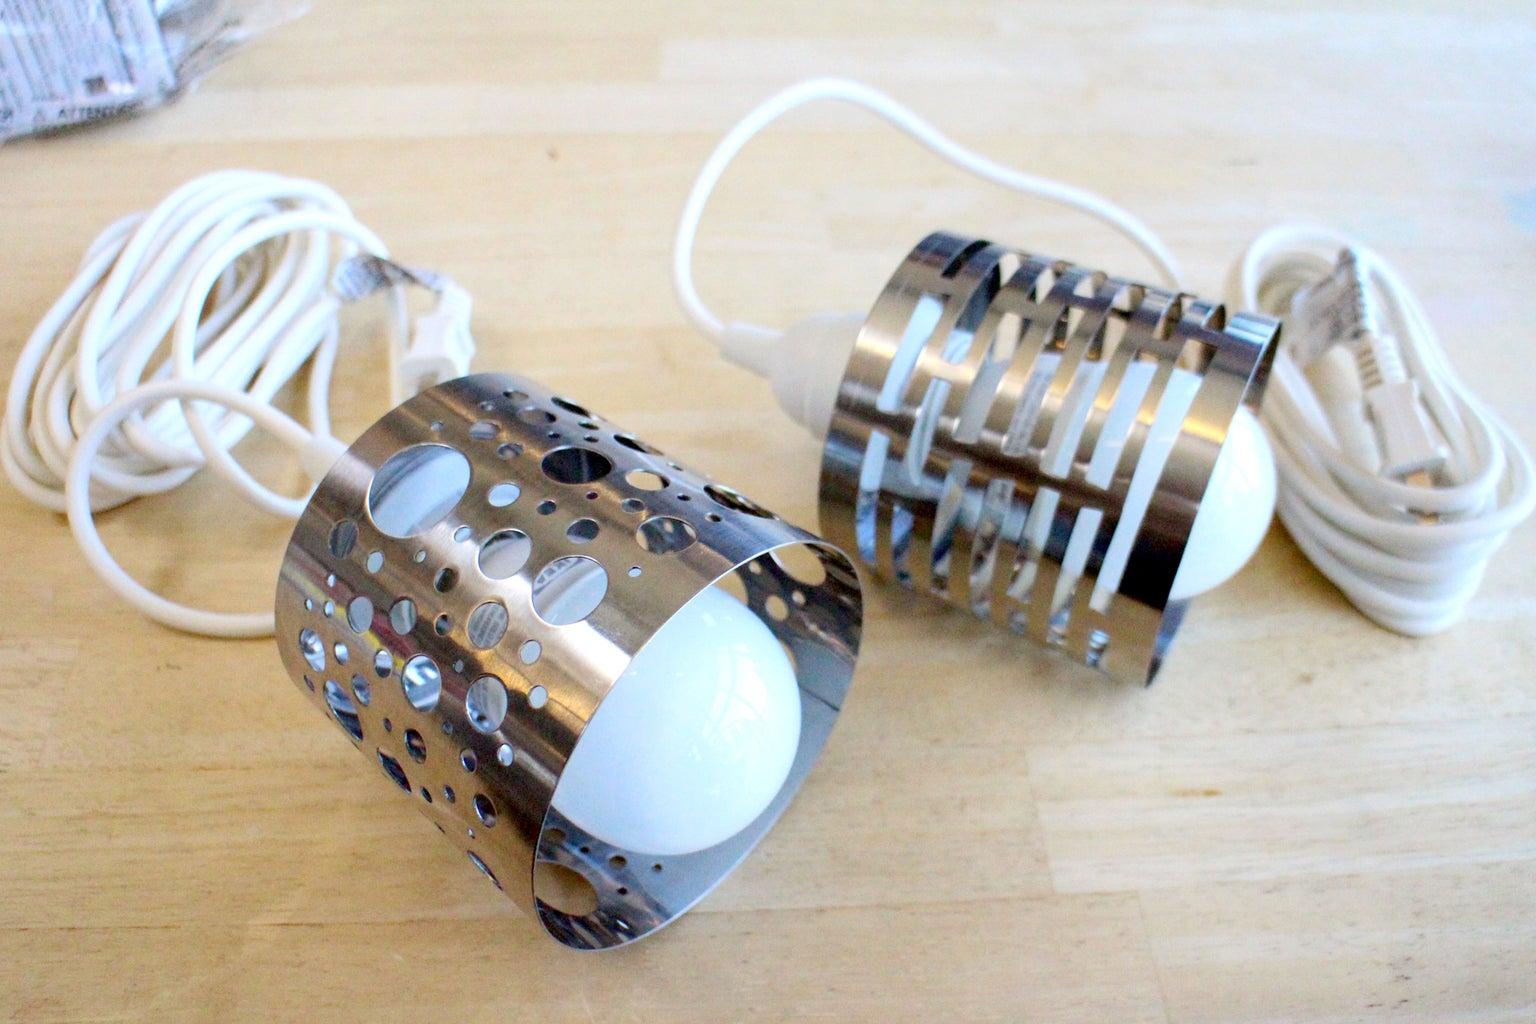 Disassemble Socket Set